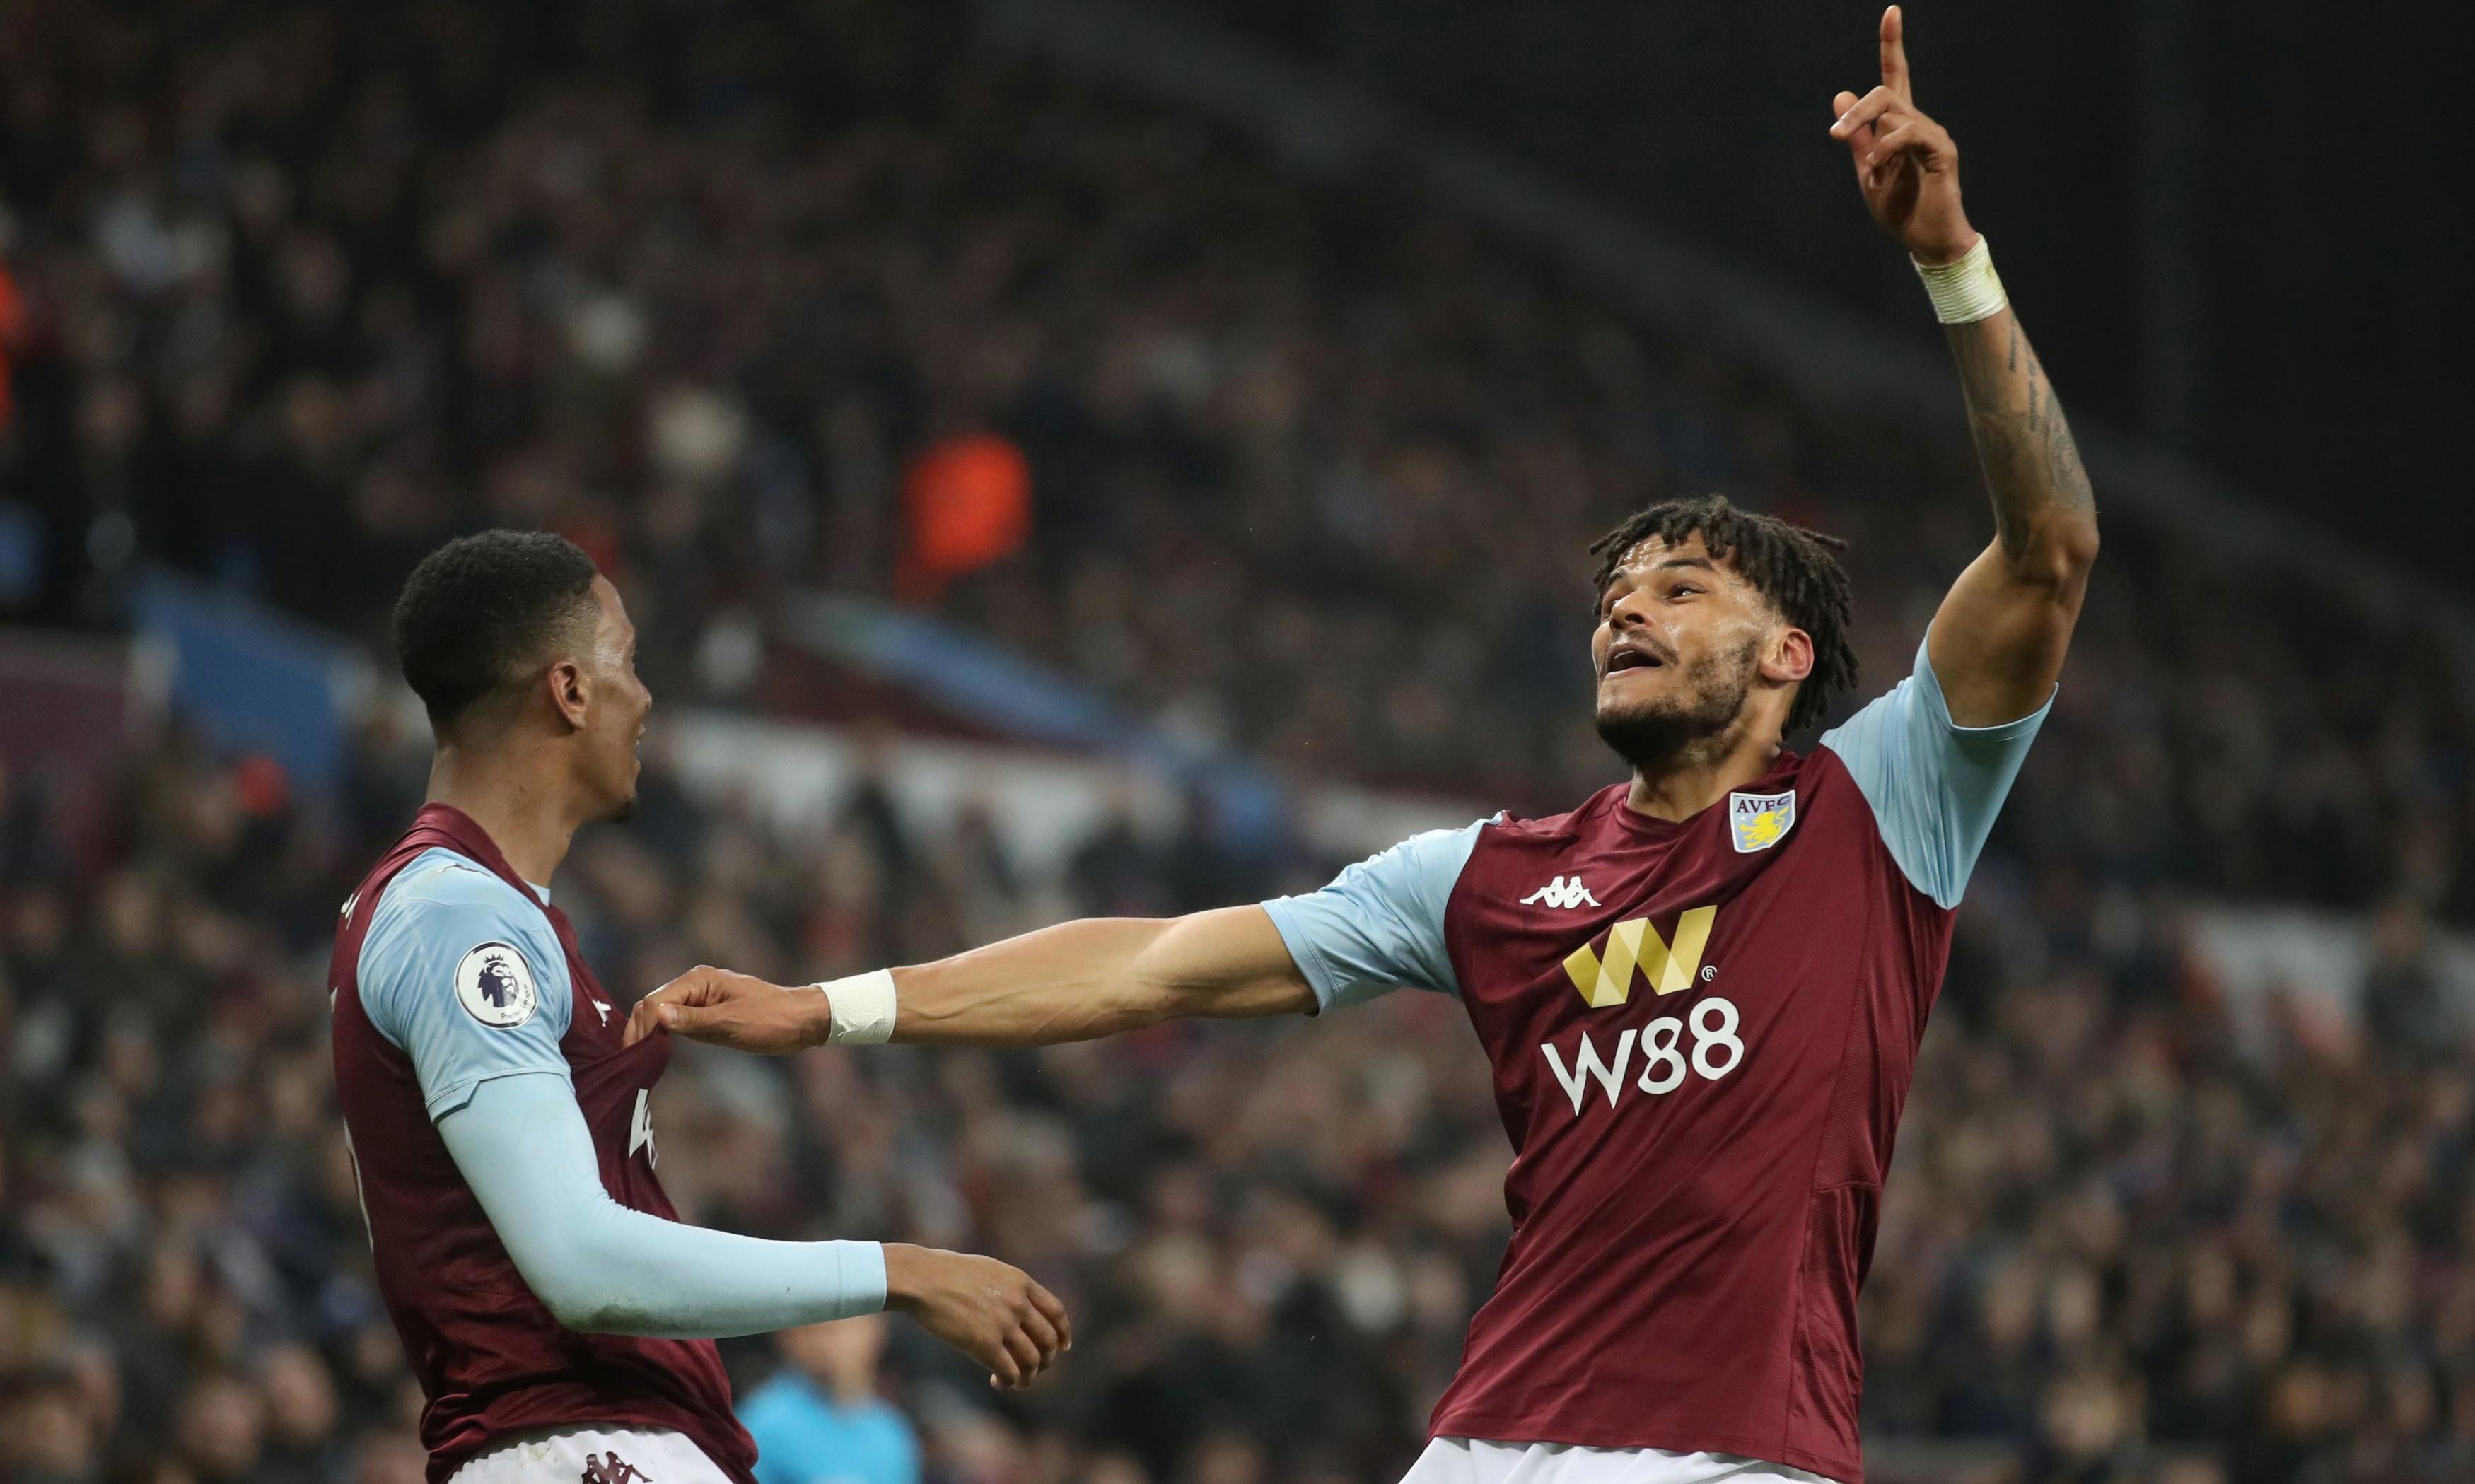 Tyrone Mings last-gasp luck earns Aston Villa vital win over Watford